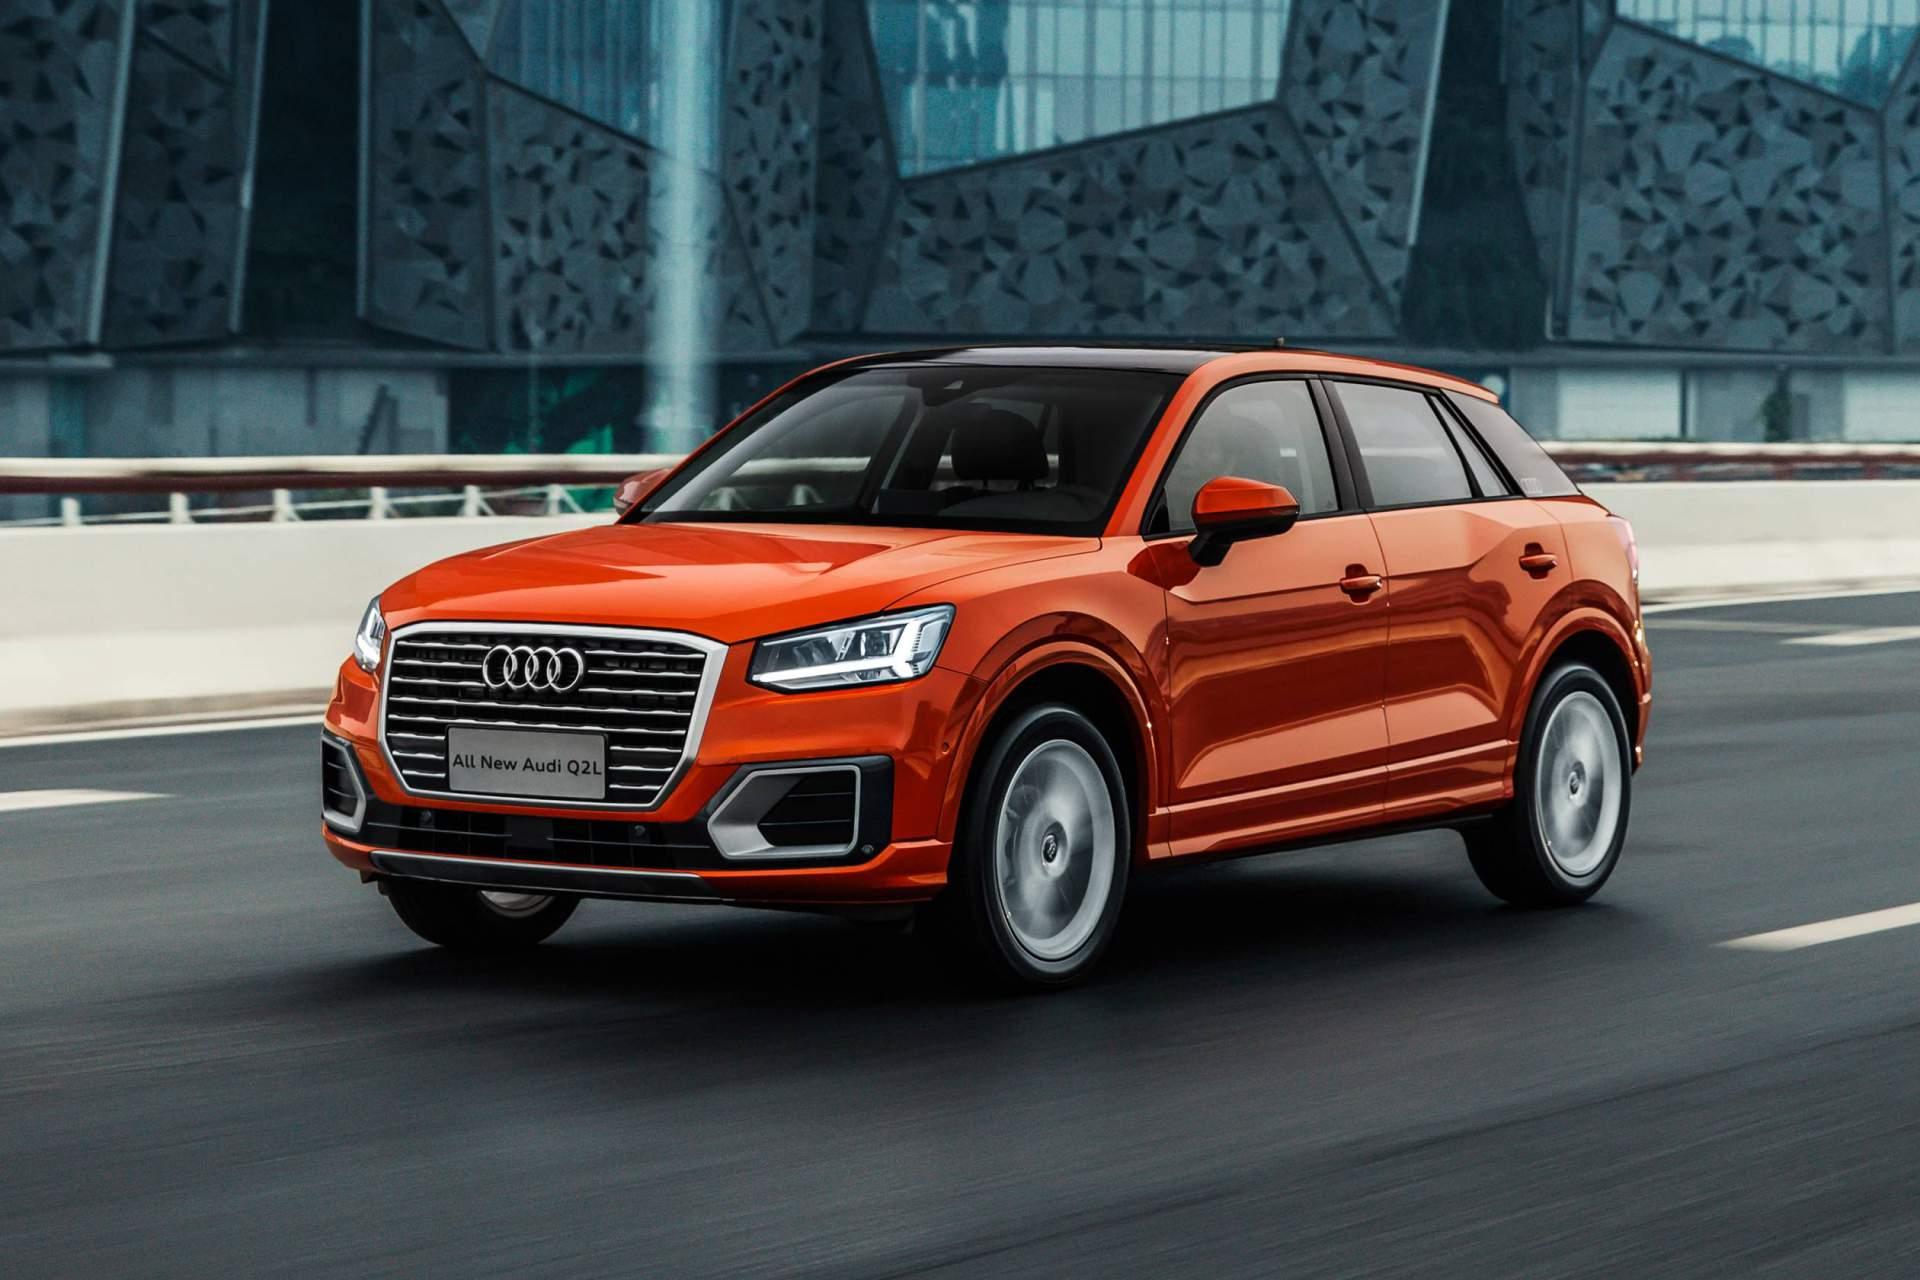 Audi_Q2_L_0004